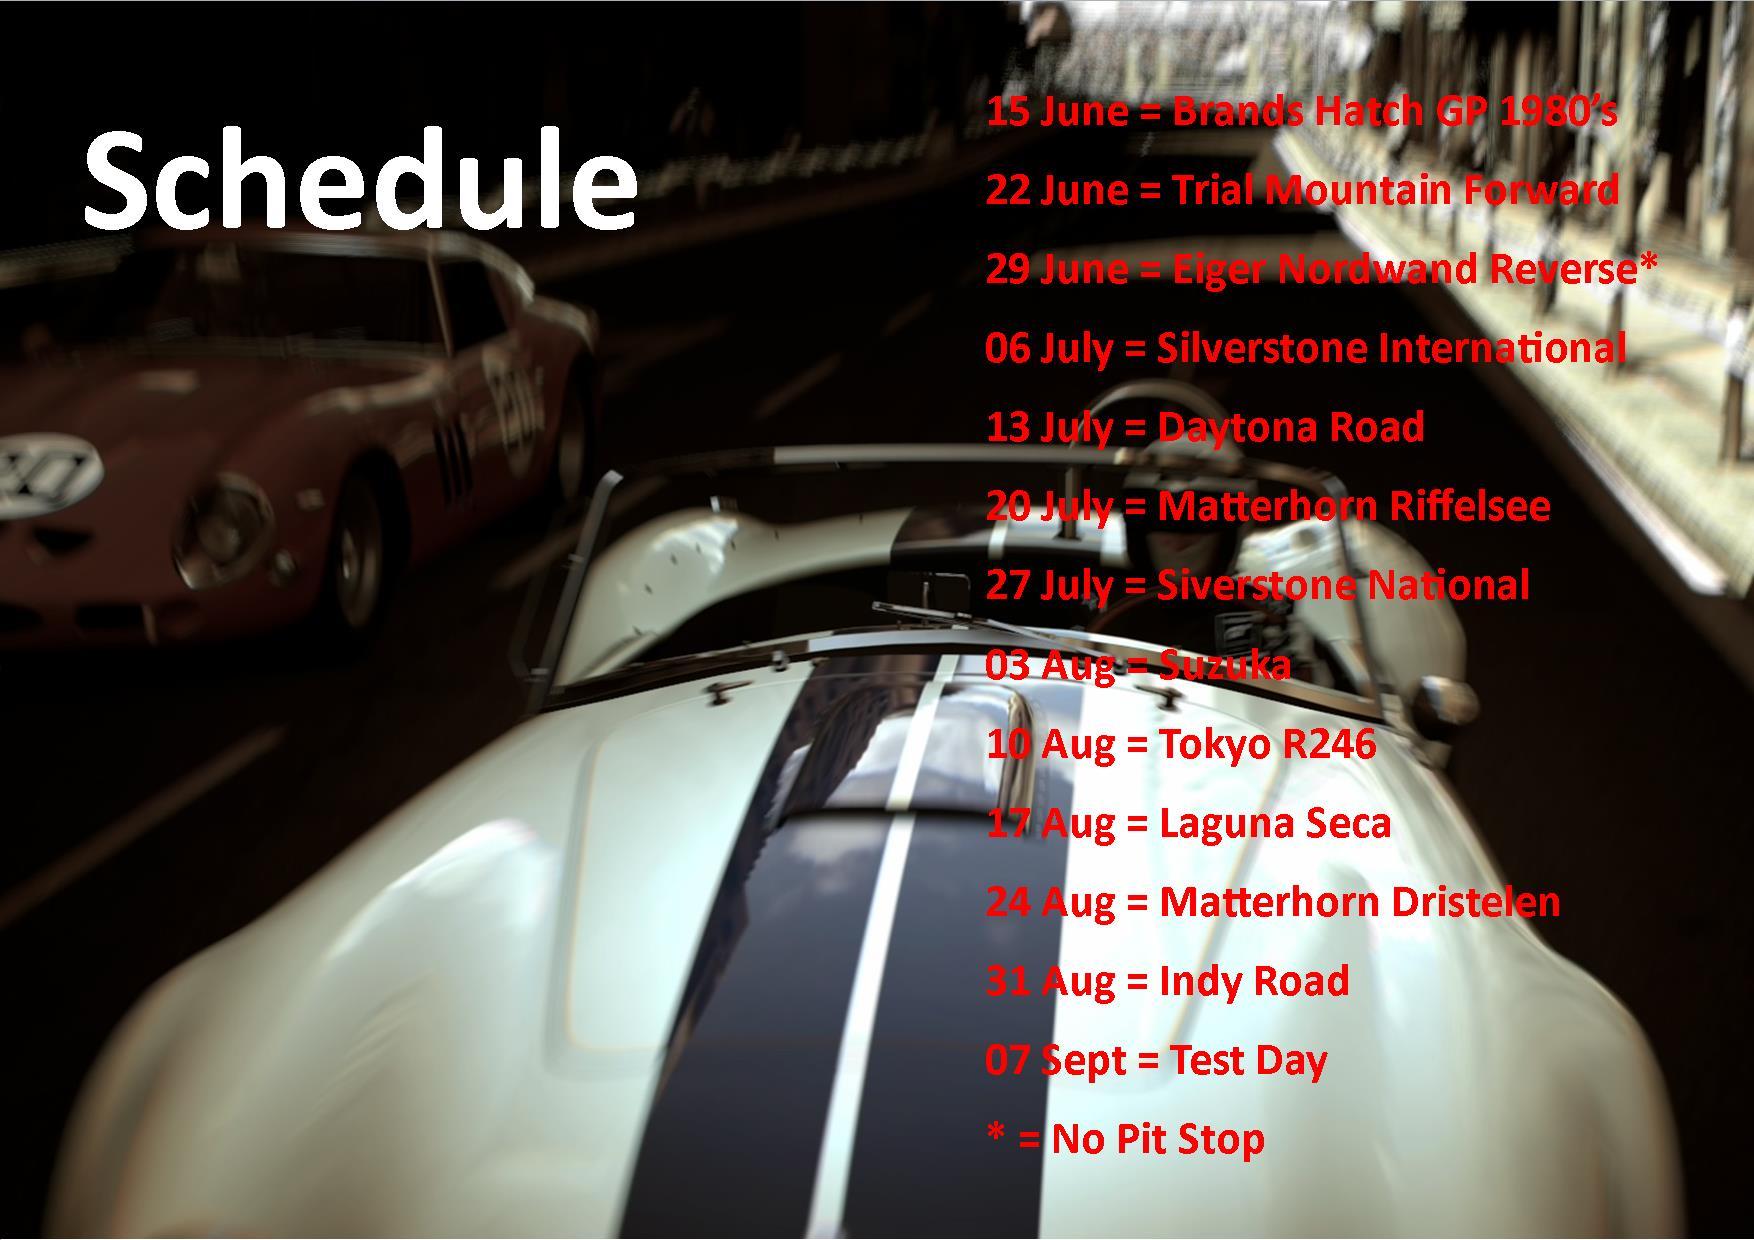 Schedule Cobra Ferrari Wars.jpg